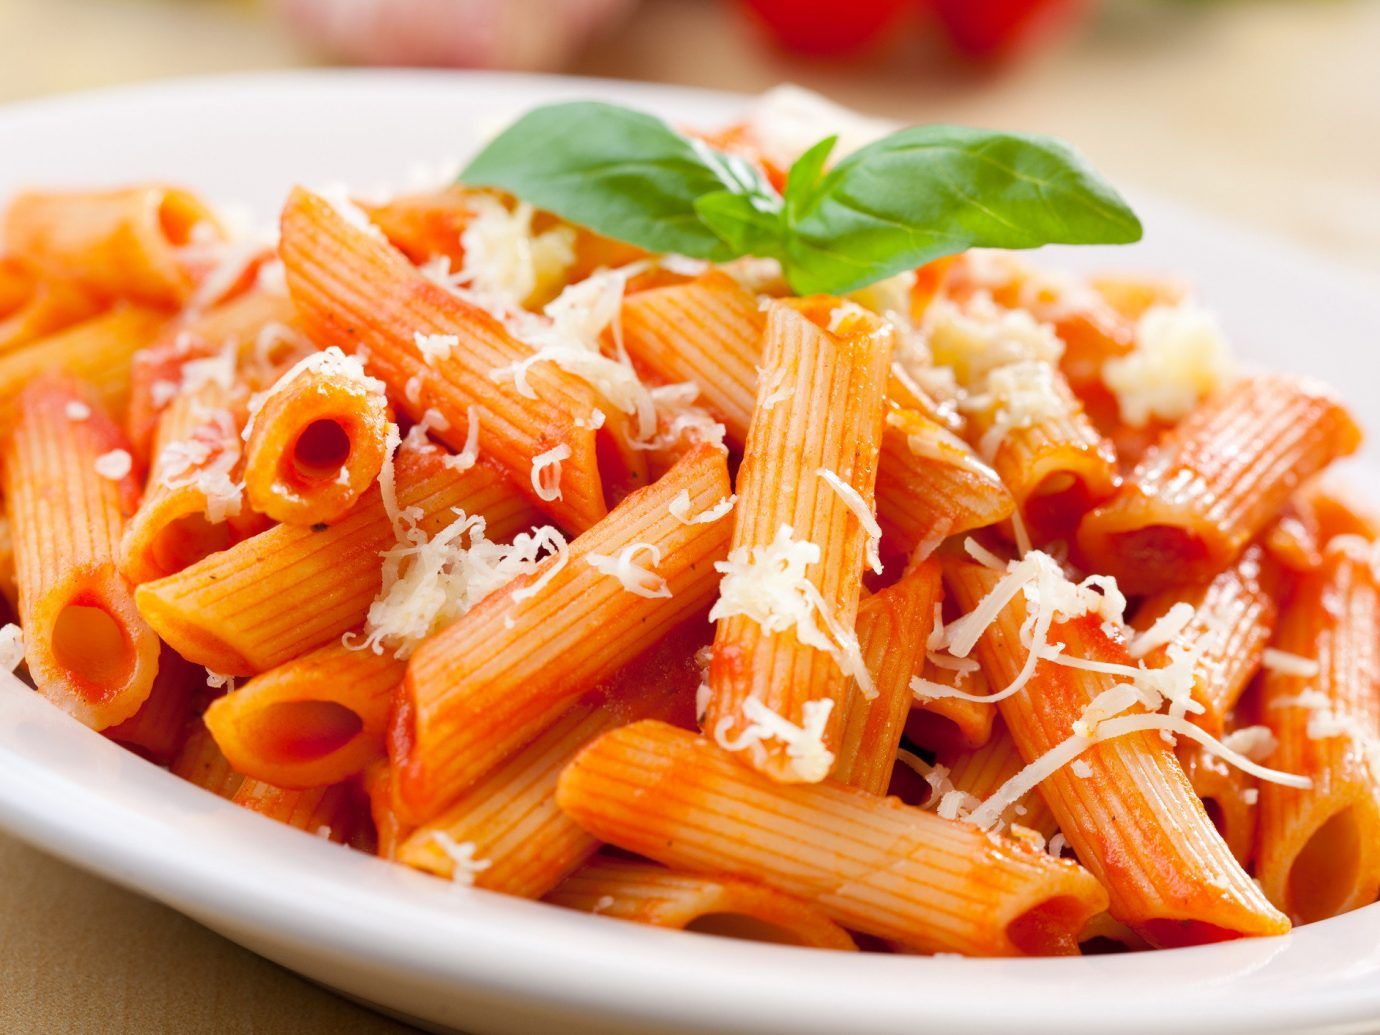 Trip Ideas food plate cuisine penne italian food dish spaghetti pasta bucatini european food produce pici vegetarian food penne alla vodka carbonara vegetable pasta pomodoro fusilli orange sliced